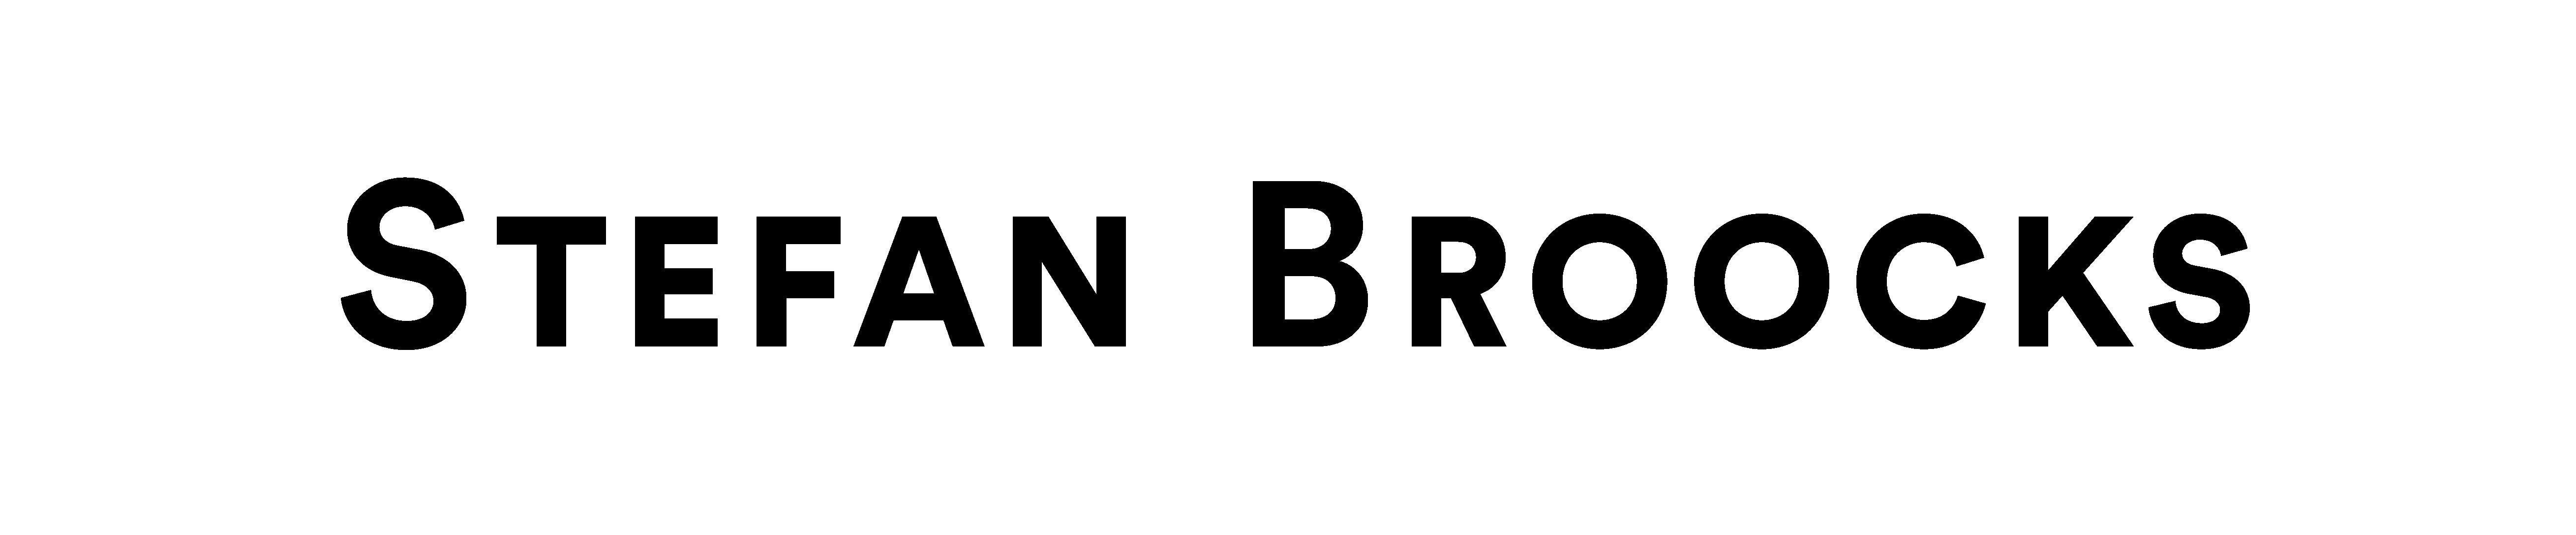 logo_broocks_mobil-03-01